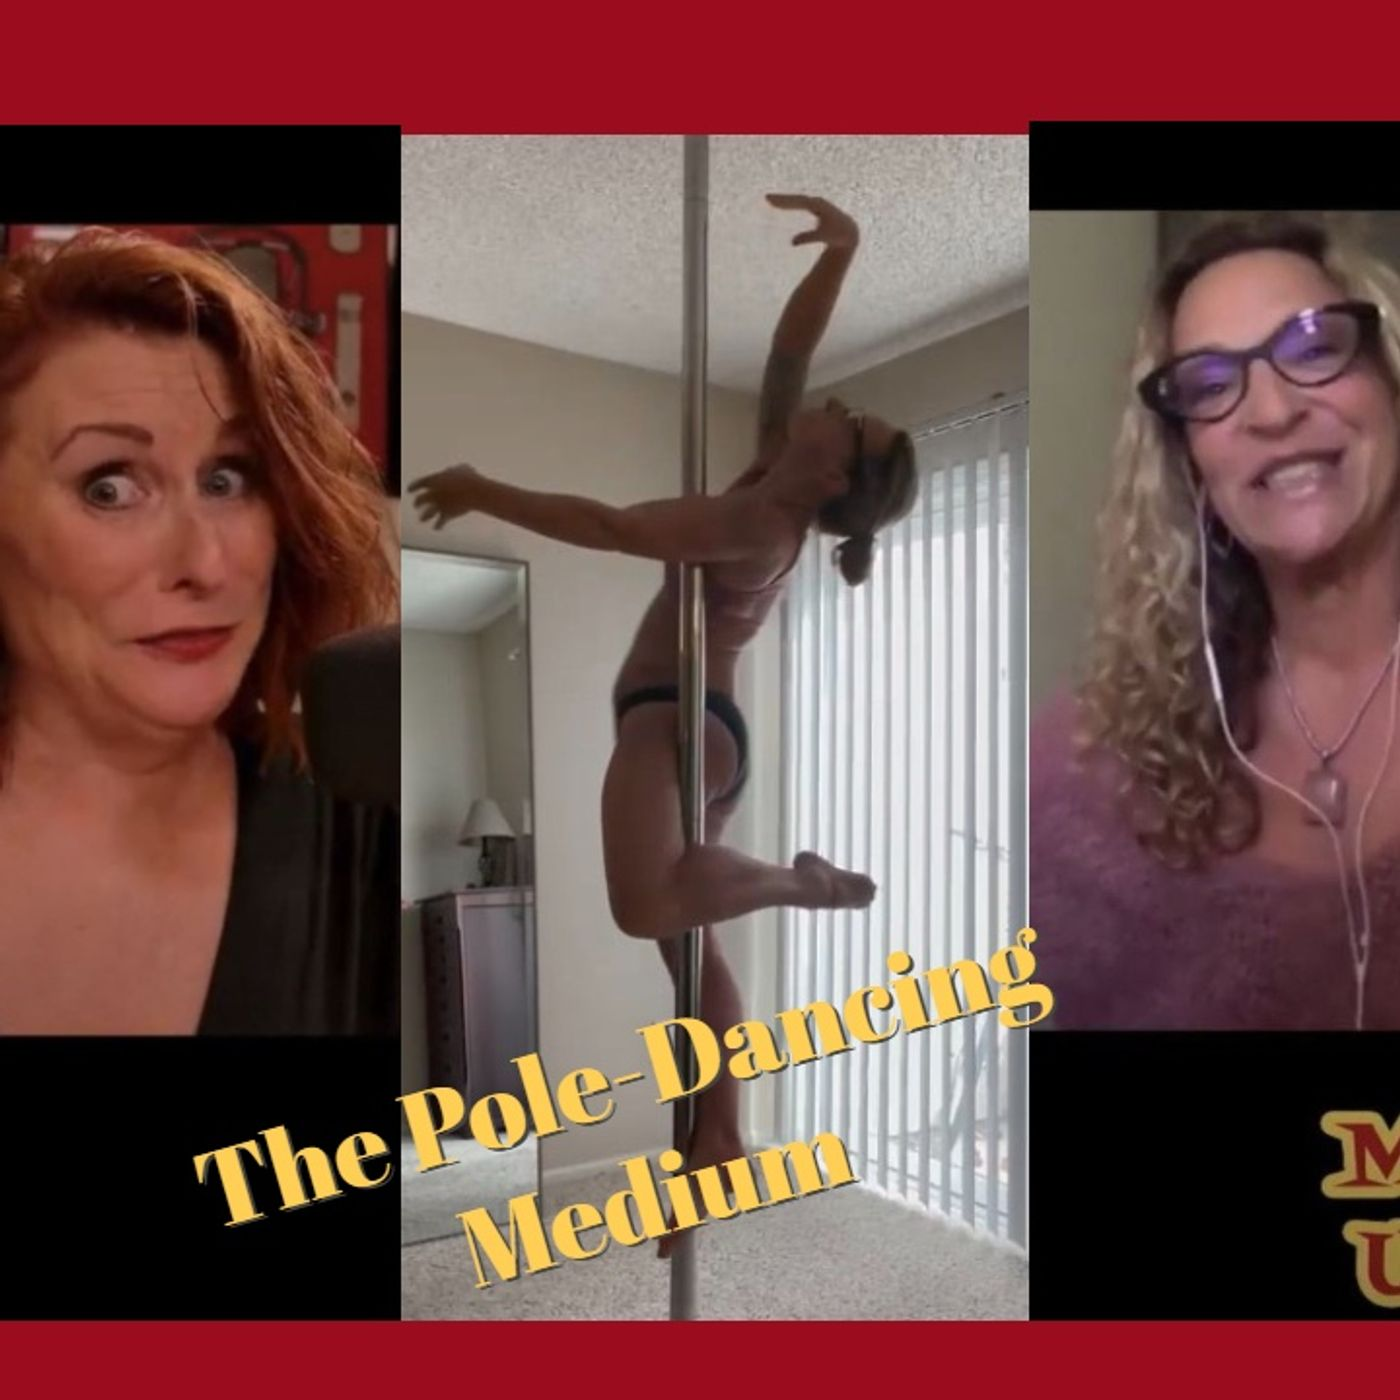 Meet the Pole Dancing Medium Amy White